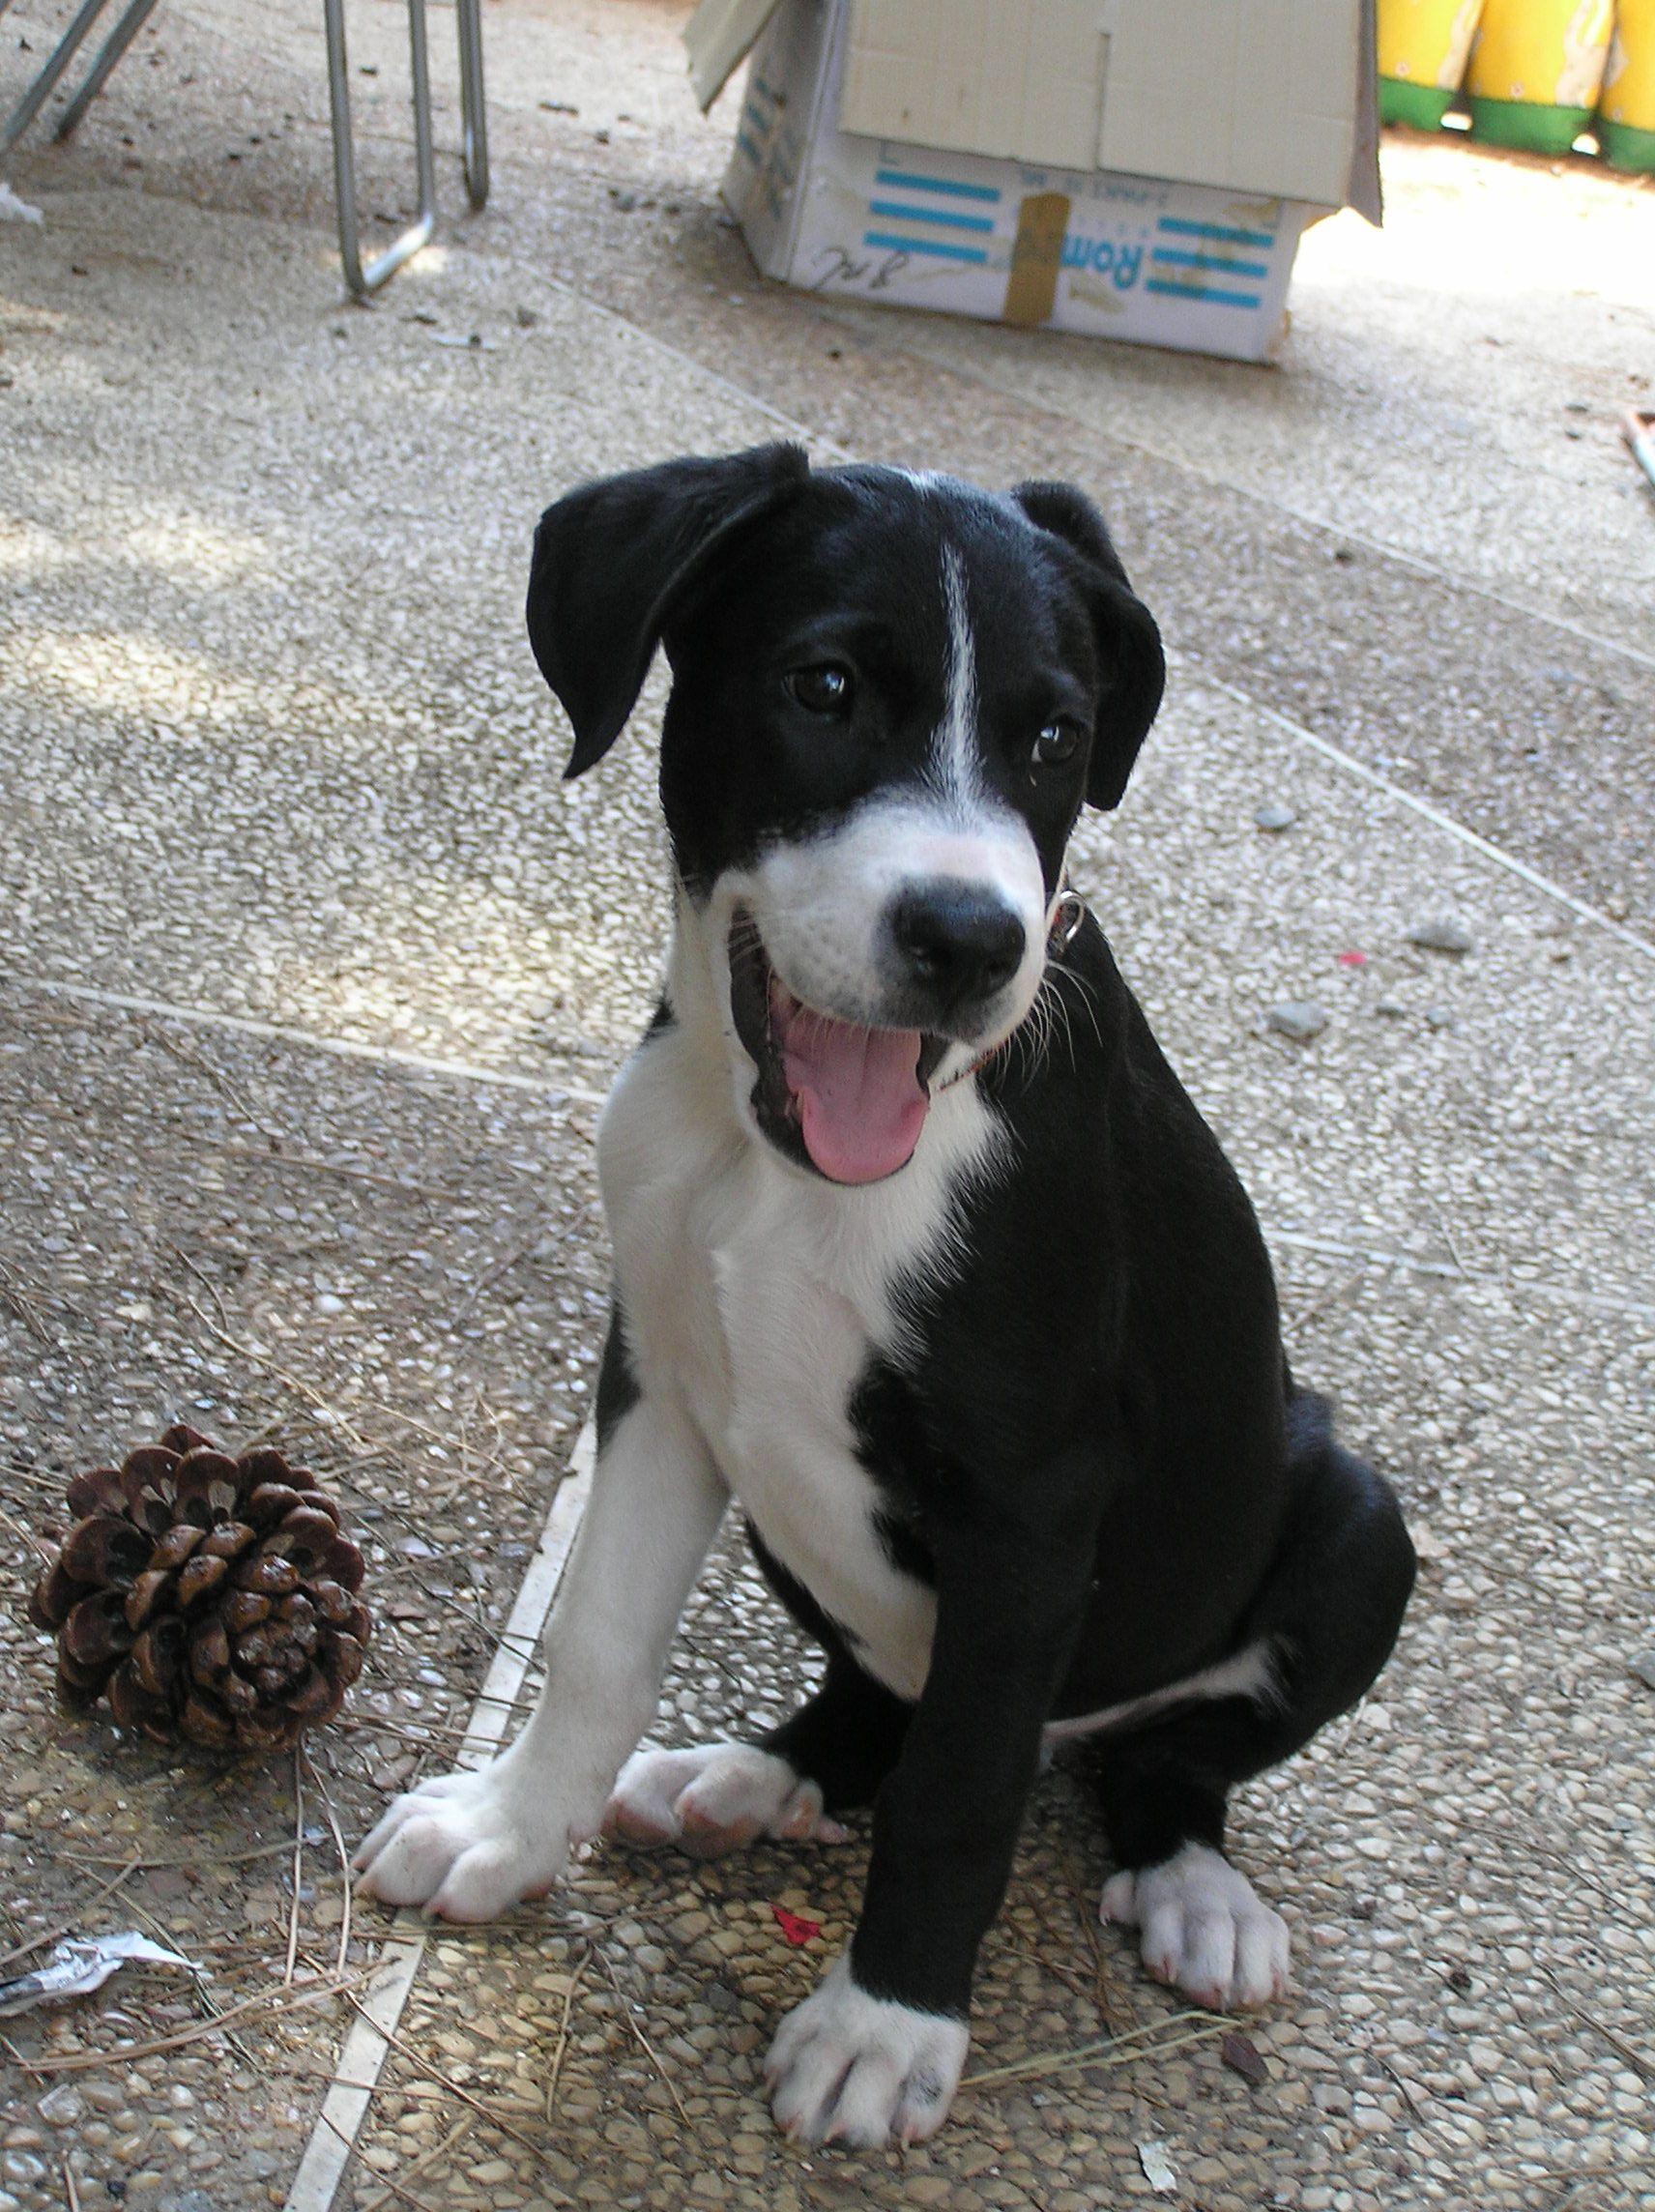 St. Johns County Pet Center Closed for Mega Adoption Event